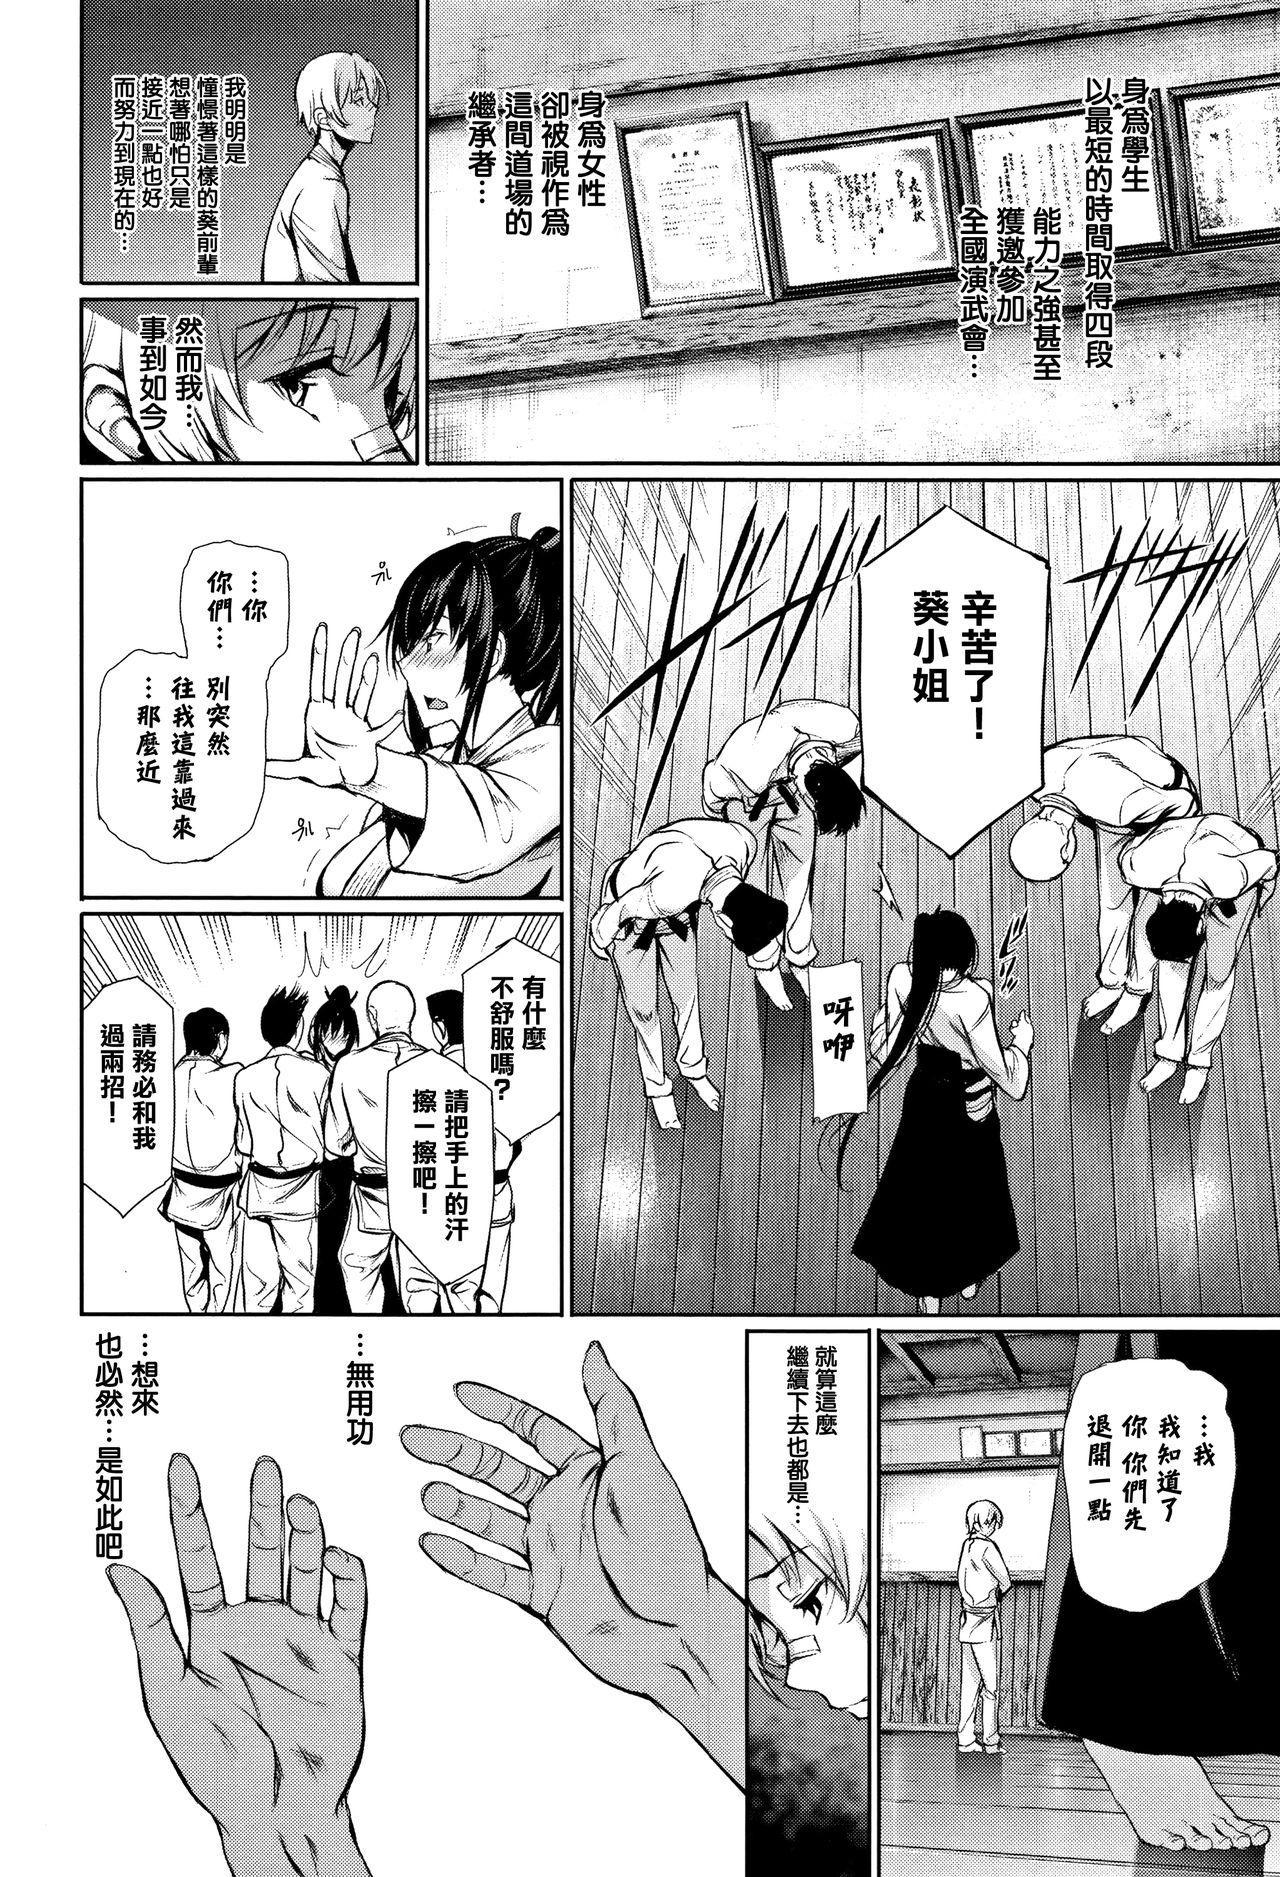 [Gentsuki] Kimi Omou Koi - I think of you. Ch. 1-7 [Chinese] [无毒汉化组] 8